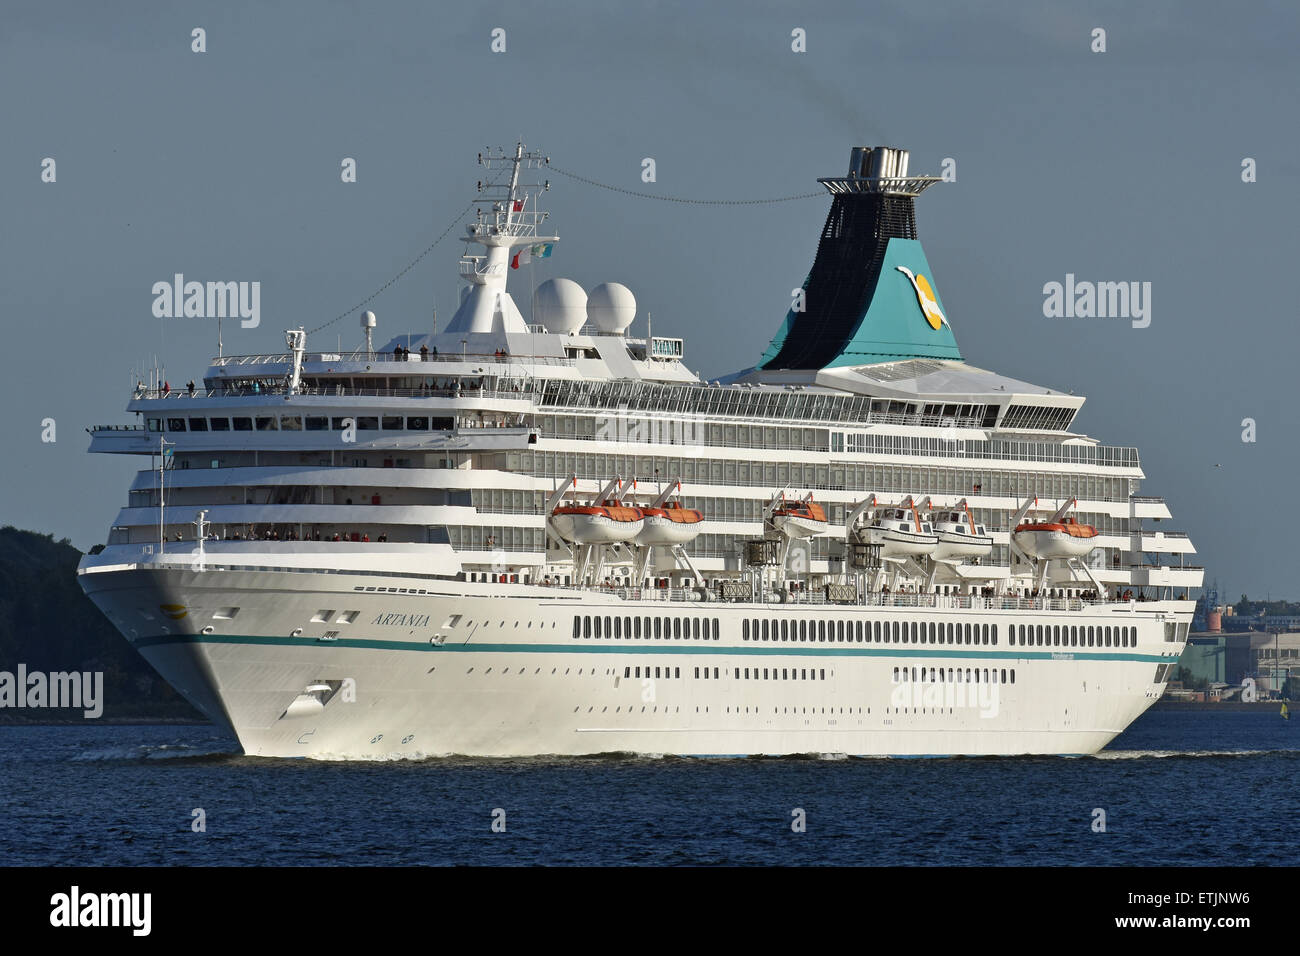 Artania leaving Kiel for a baltic cruise - Stock Image